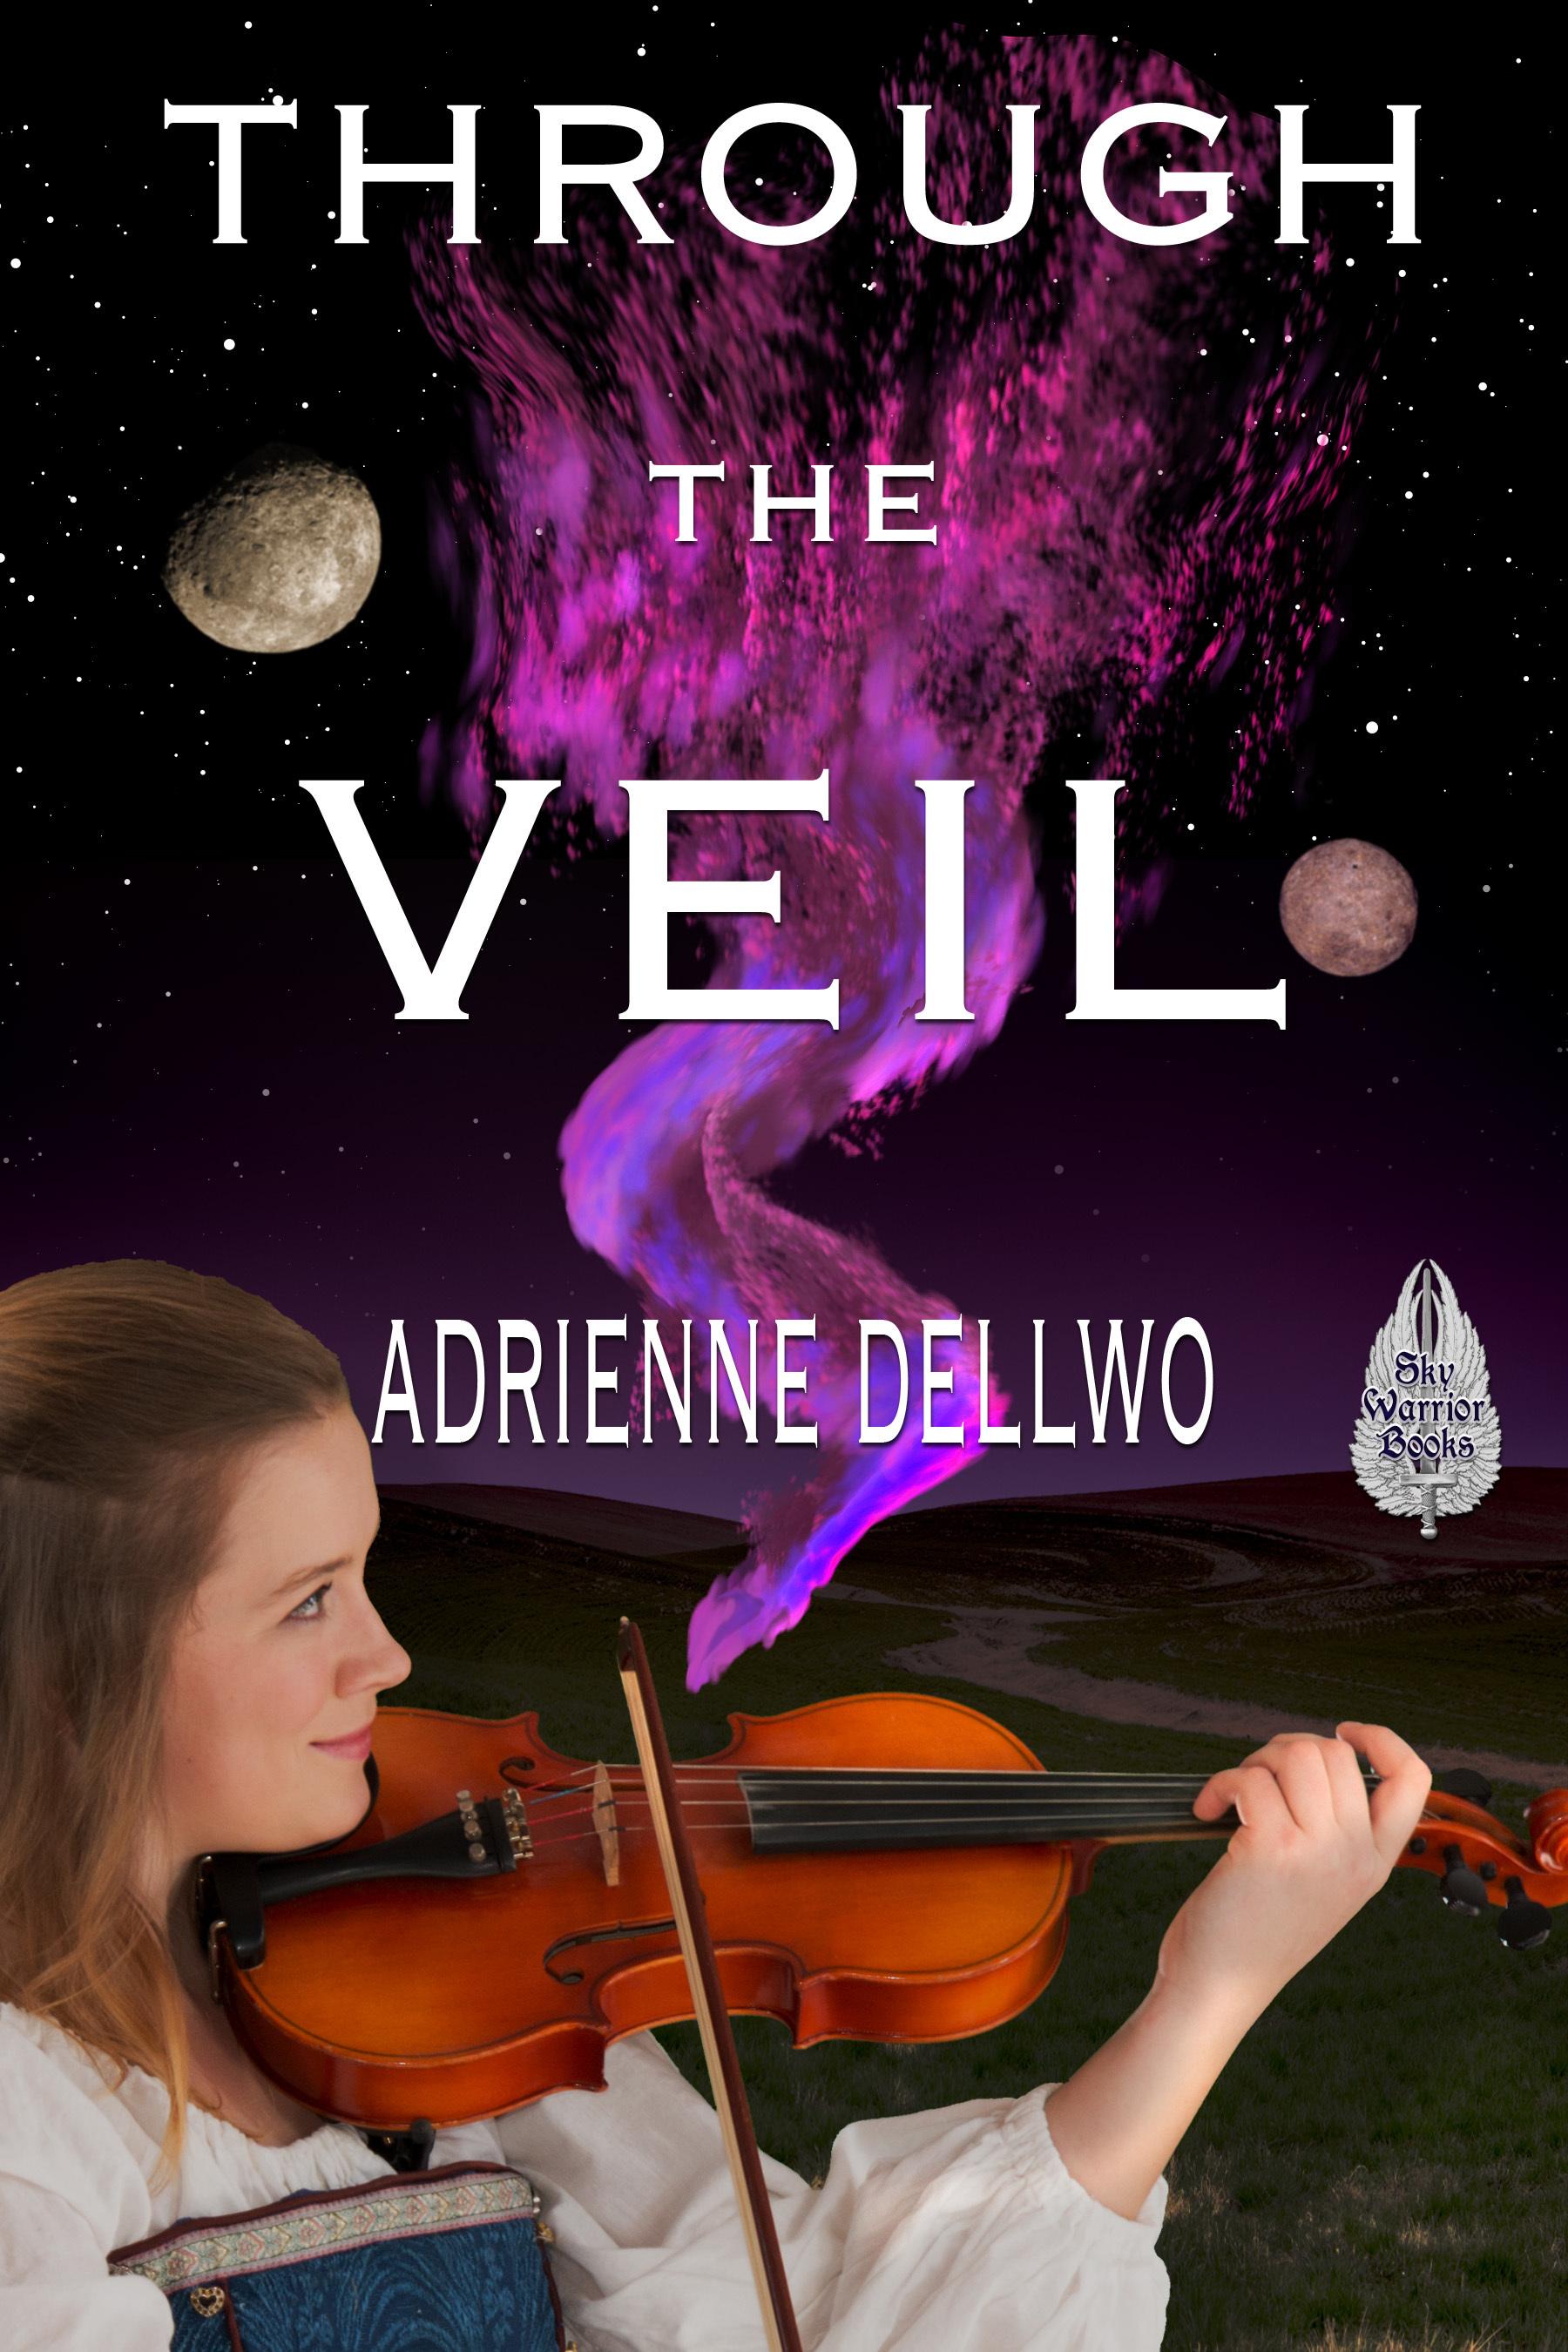 Through the Veil Adrienne Dellwo